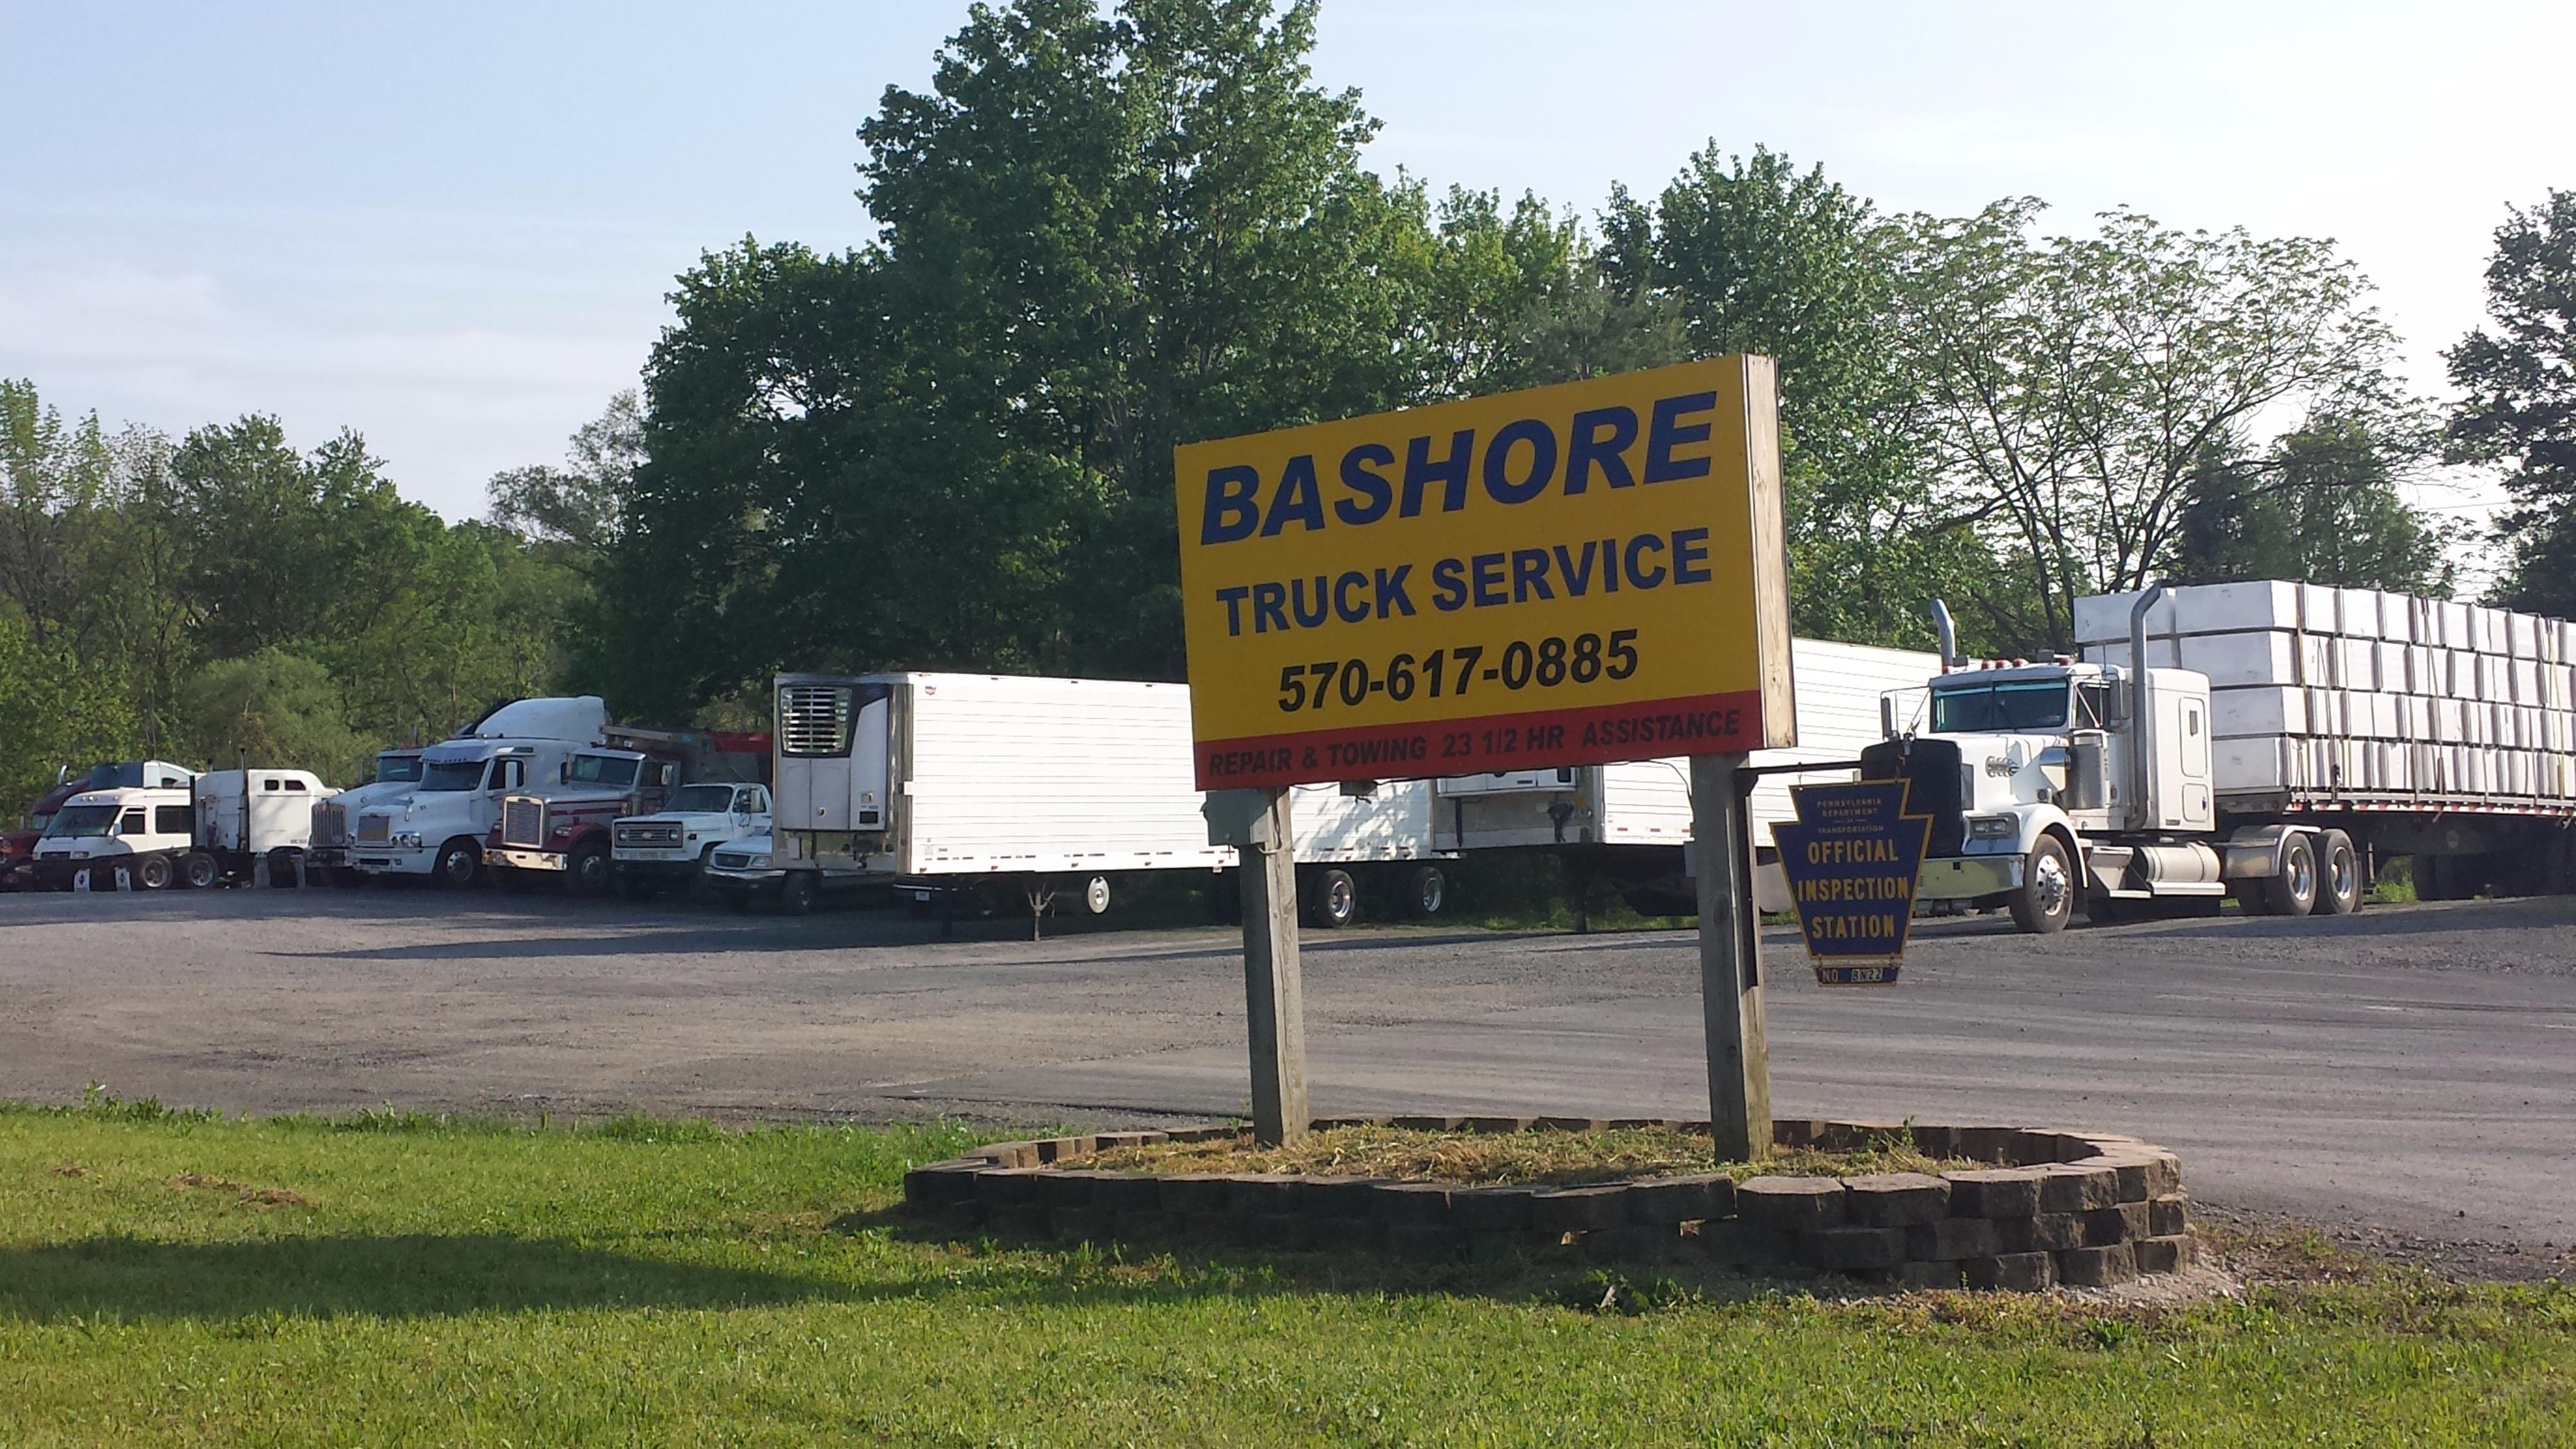 Bashore Truck service image 2